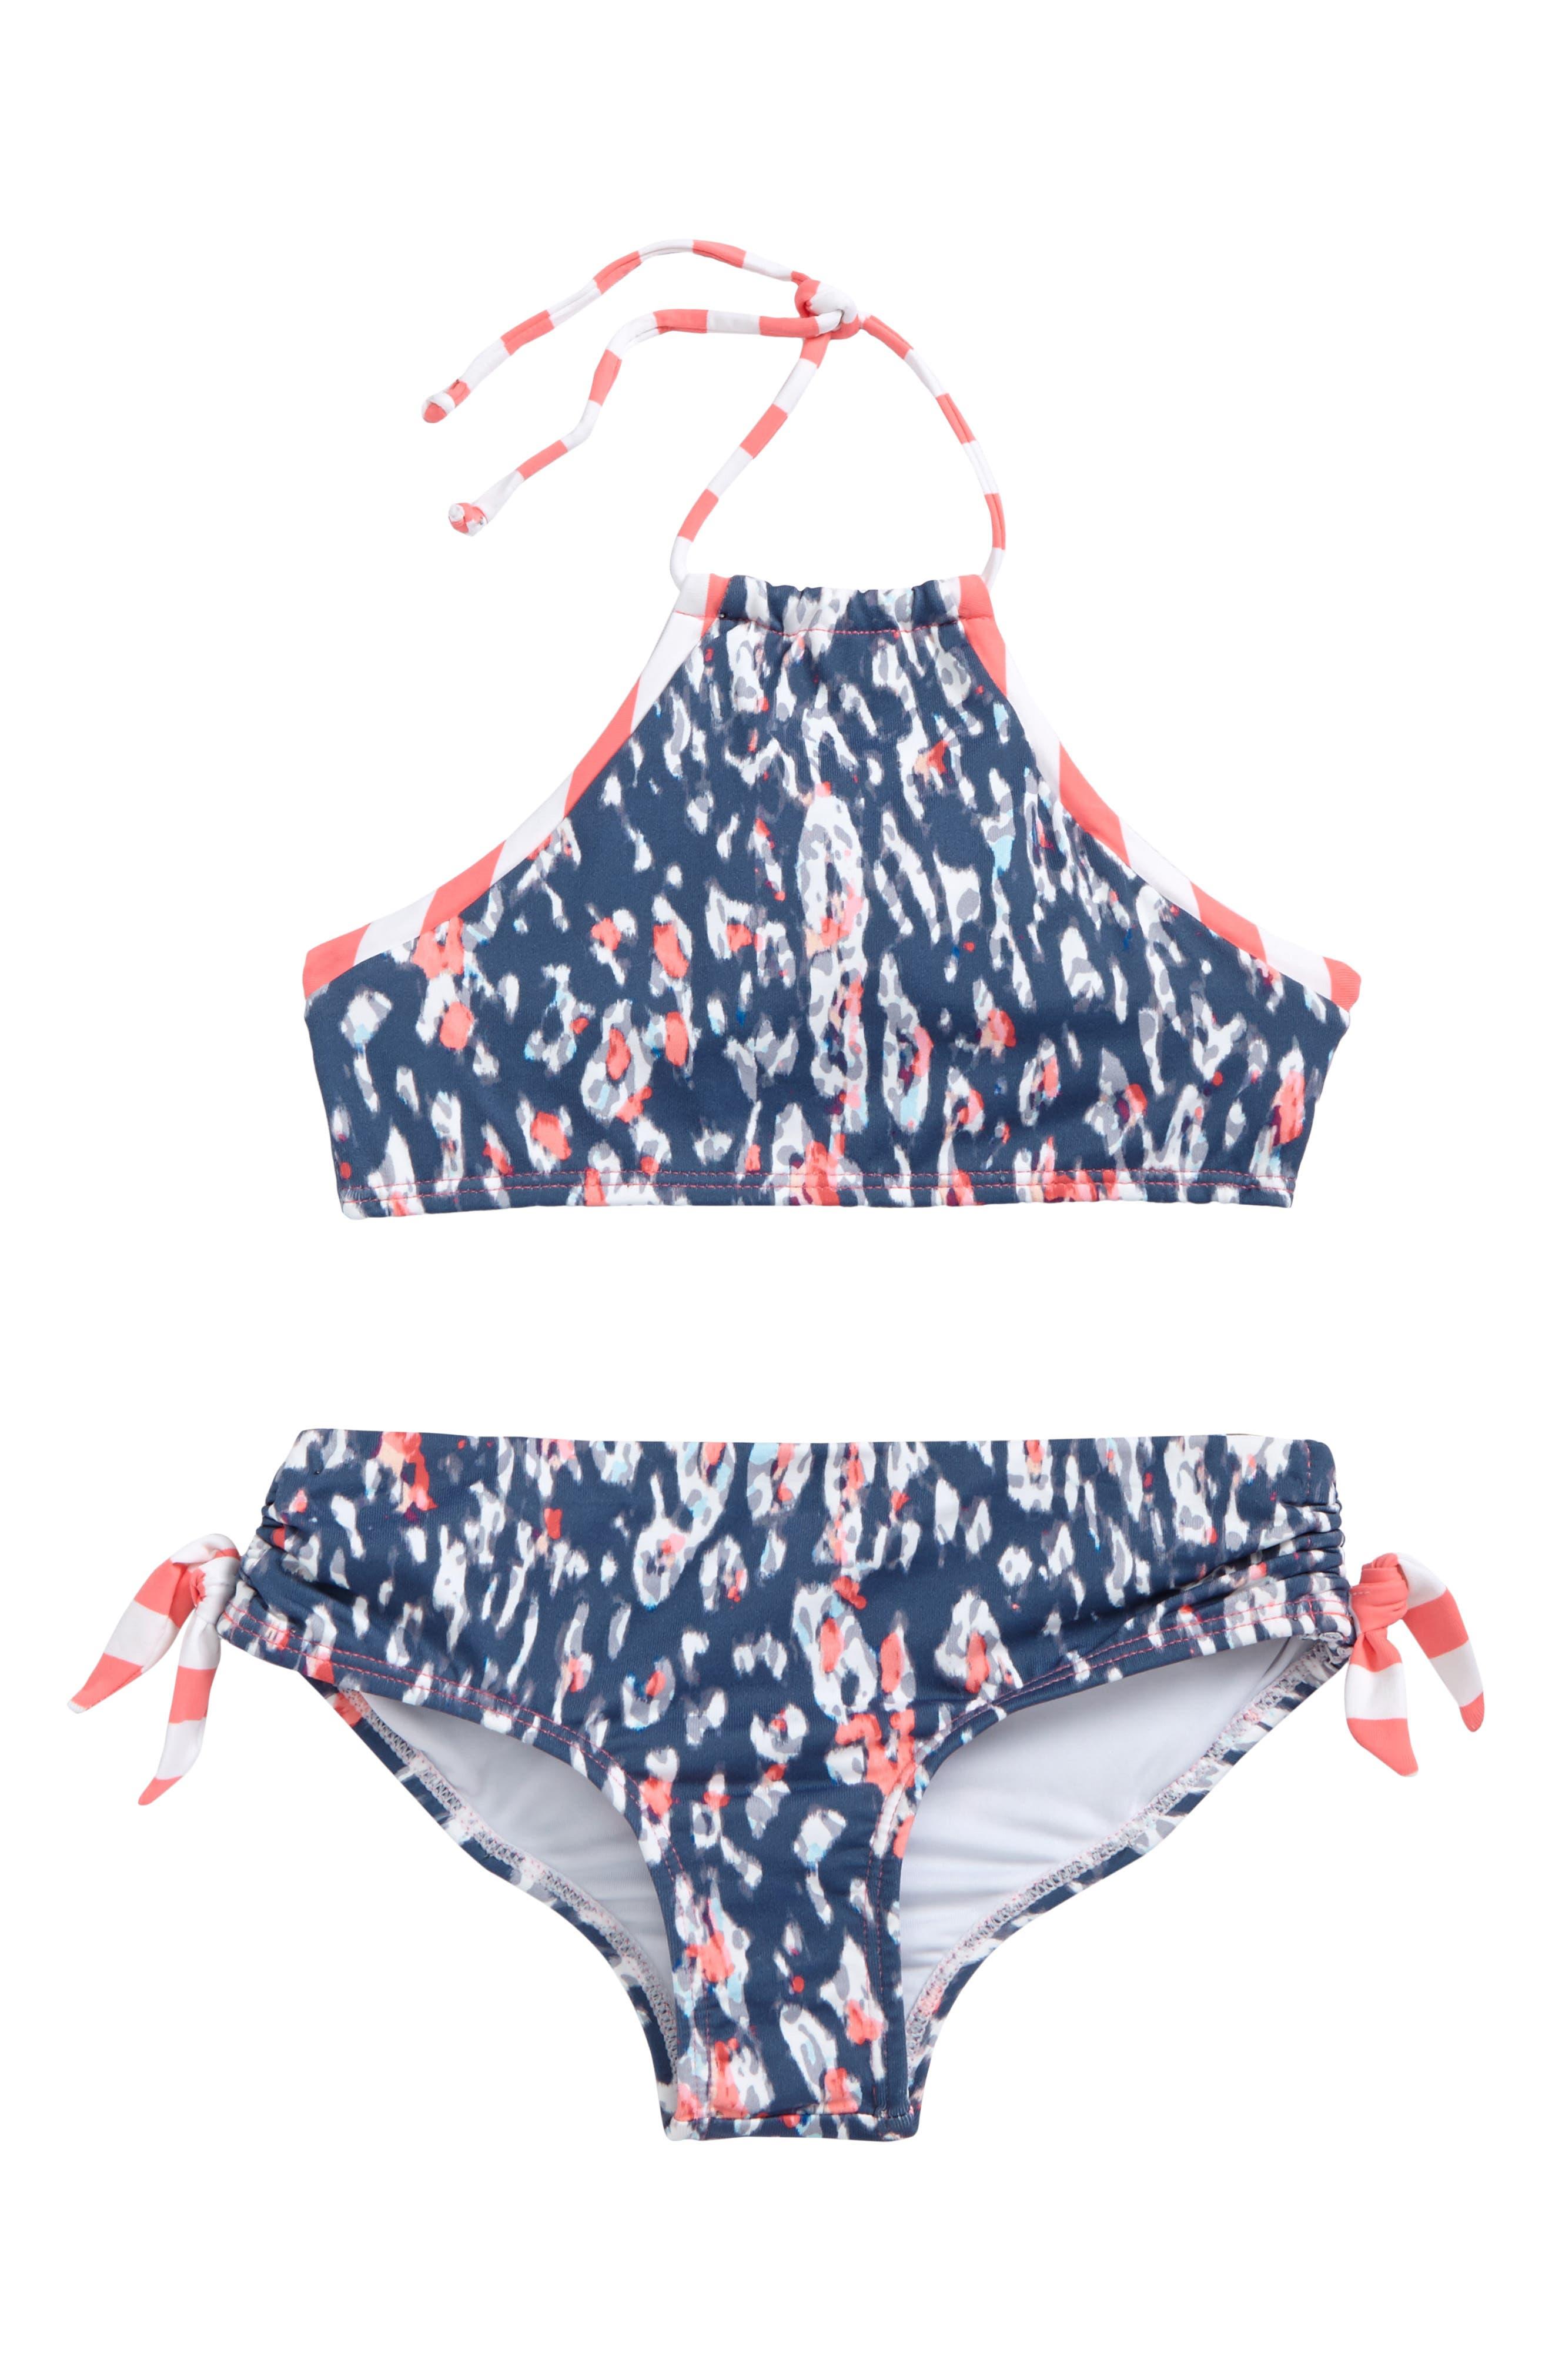 Main Image - OndadeMar Aluvia Two-Piece Swimsuit (Big Girls)